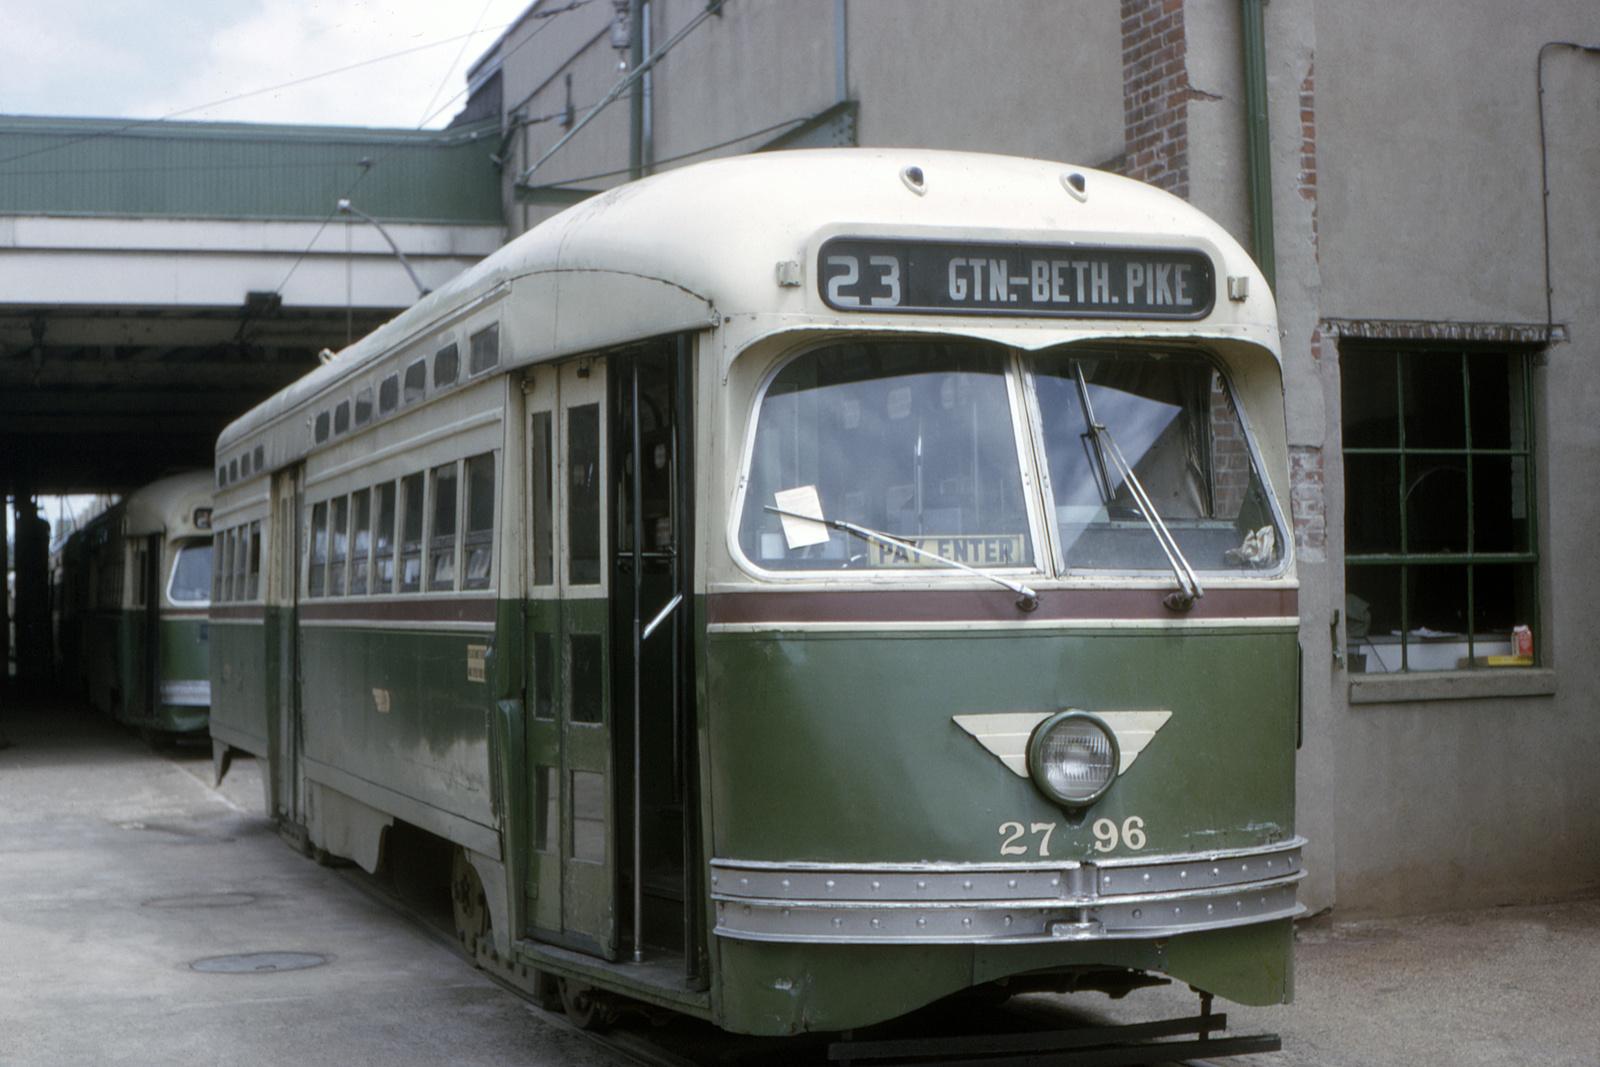 (575k, 1600x1067)<br><b>Country:</b> United States<br><b>City:</b> Philadelphia, PA<br><b>System:</b> SEPTA (or Predecessor)<br><b>Line:</b> Rt. 23-Germantown<br><b>Location:</b> Germantown Depot<br><b>Car:</b> PTC/SEPTA Postwar All-electric PCC (St.Louis, 1947) 2796 <br><b>Collection of:</b> David Pirmann<br><b>Date:</b> 5/1964<br><b>Viewed (this week/total):</b> 0 / 66